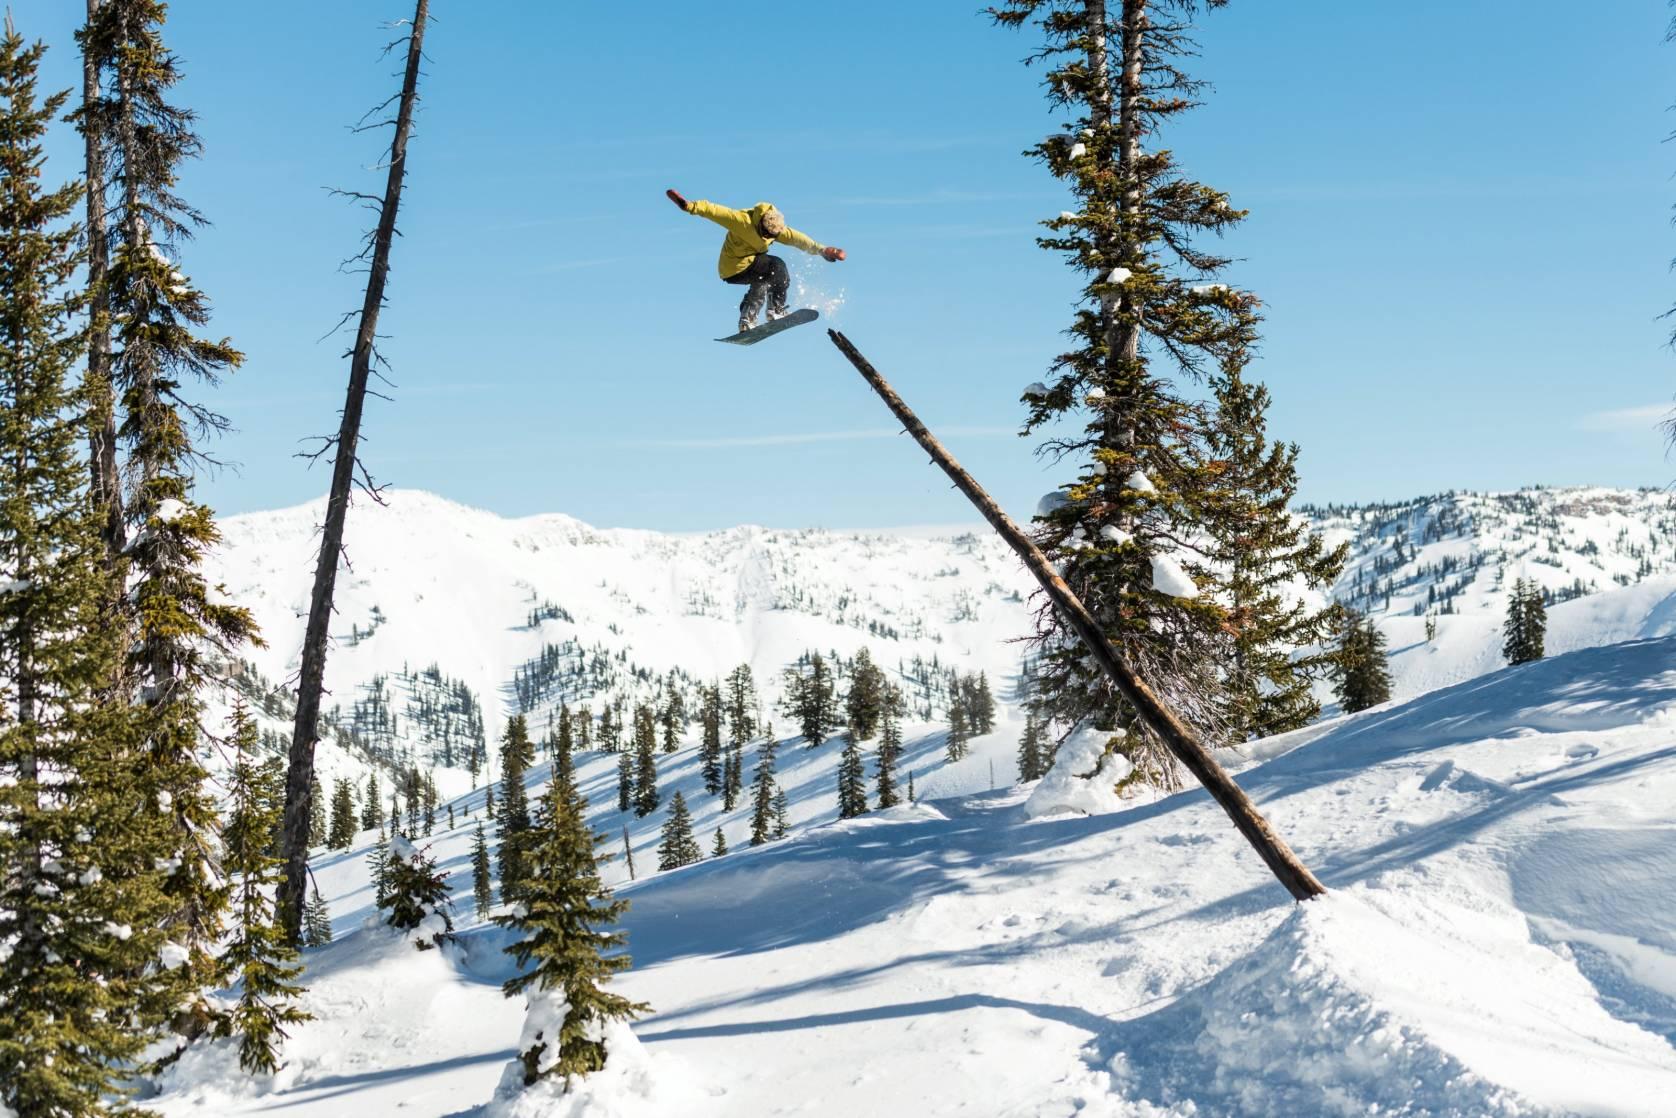 Ben Ferguson snowboarder